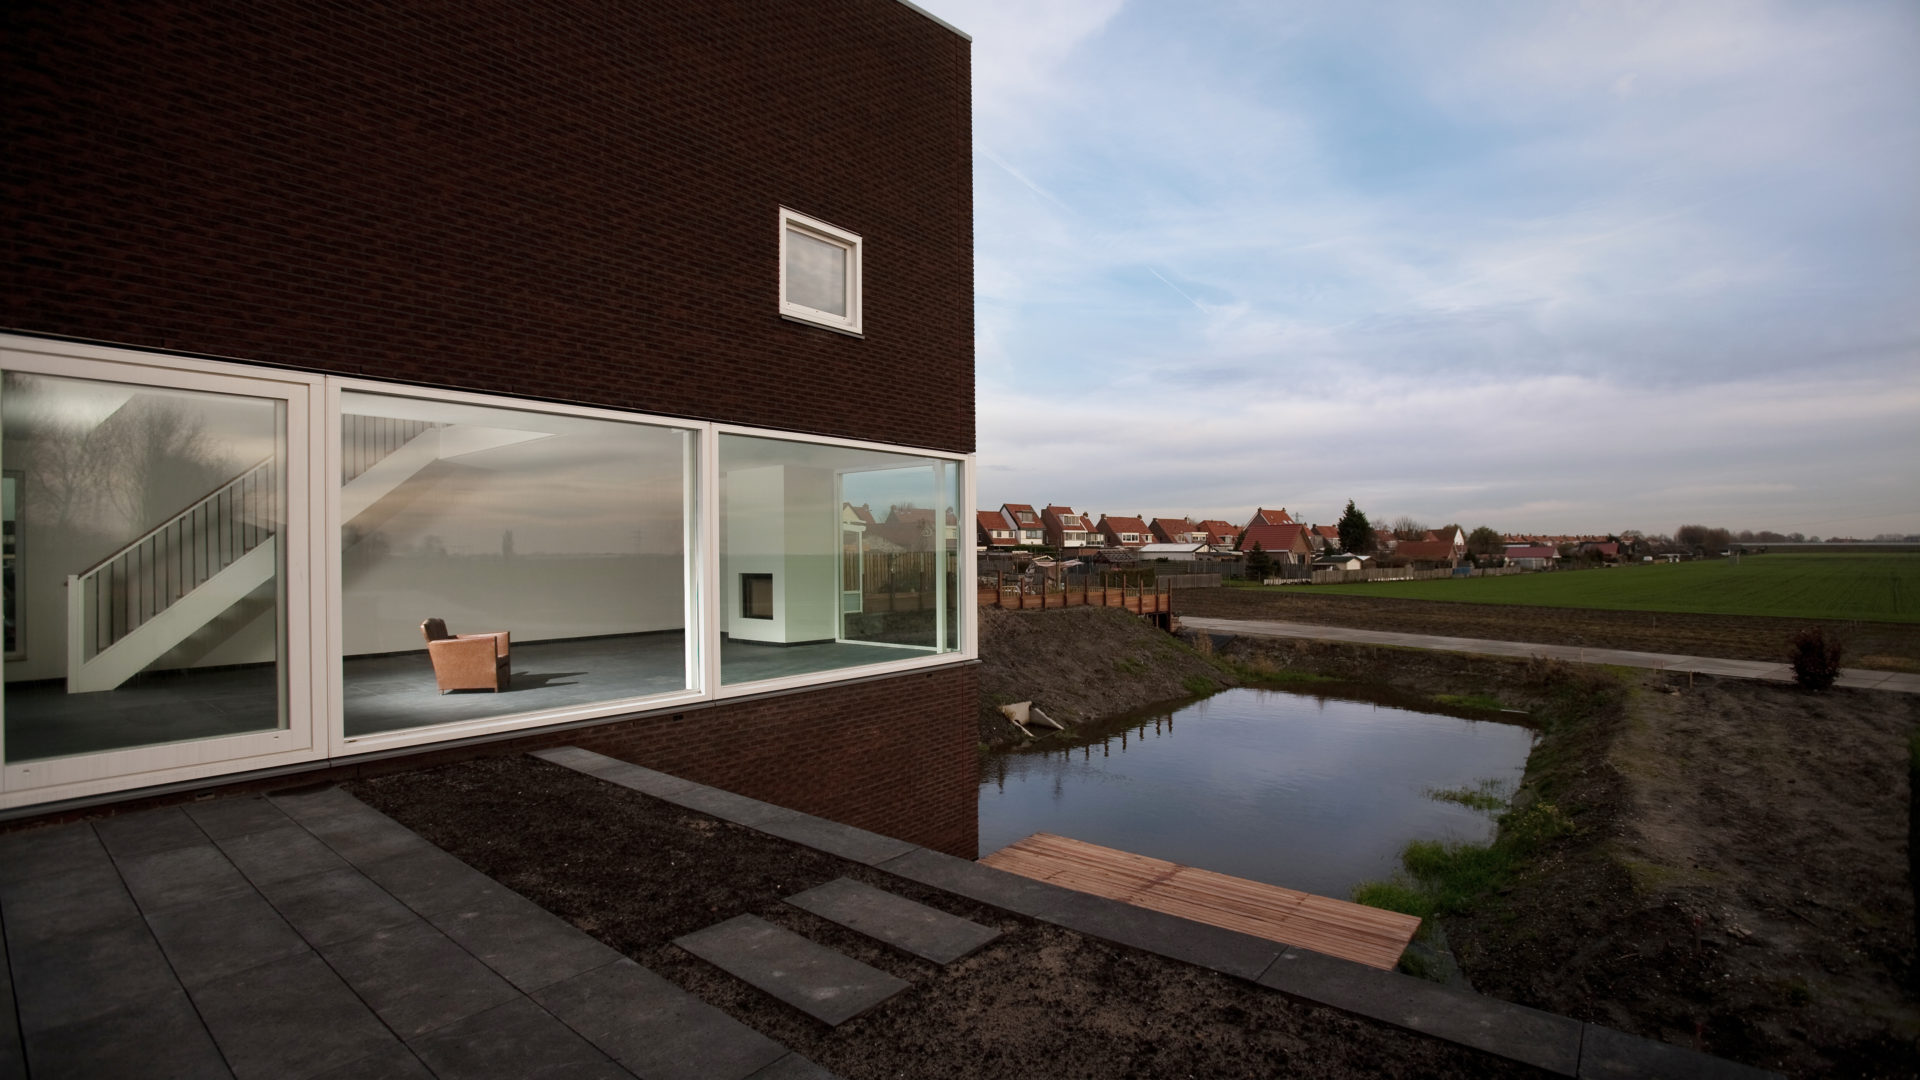 Exterieur van het moderne woonhuis in Beinsdorp